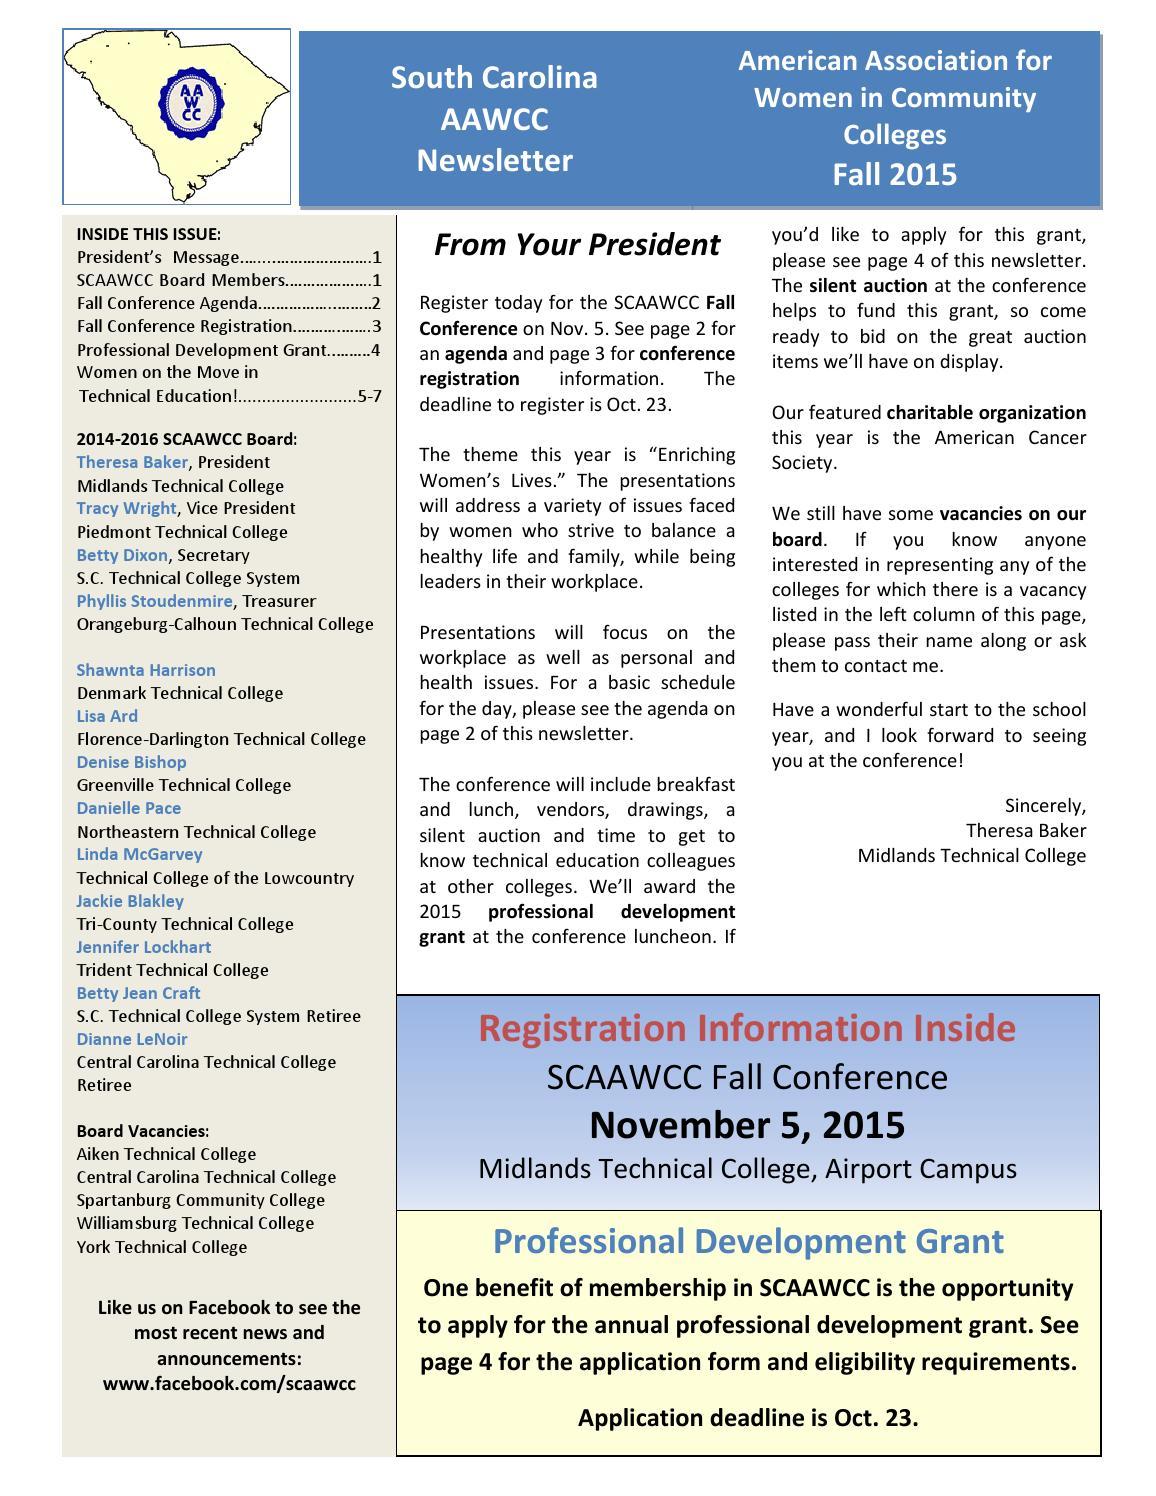 Fall 2015 Scaawcc Newsletter By Scaawcc Issuu